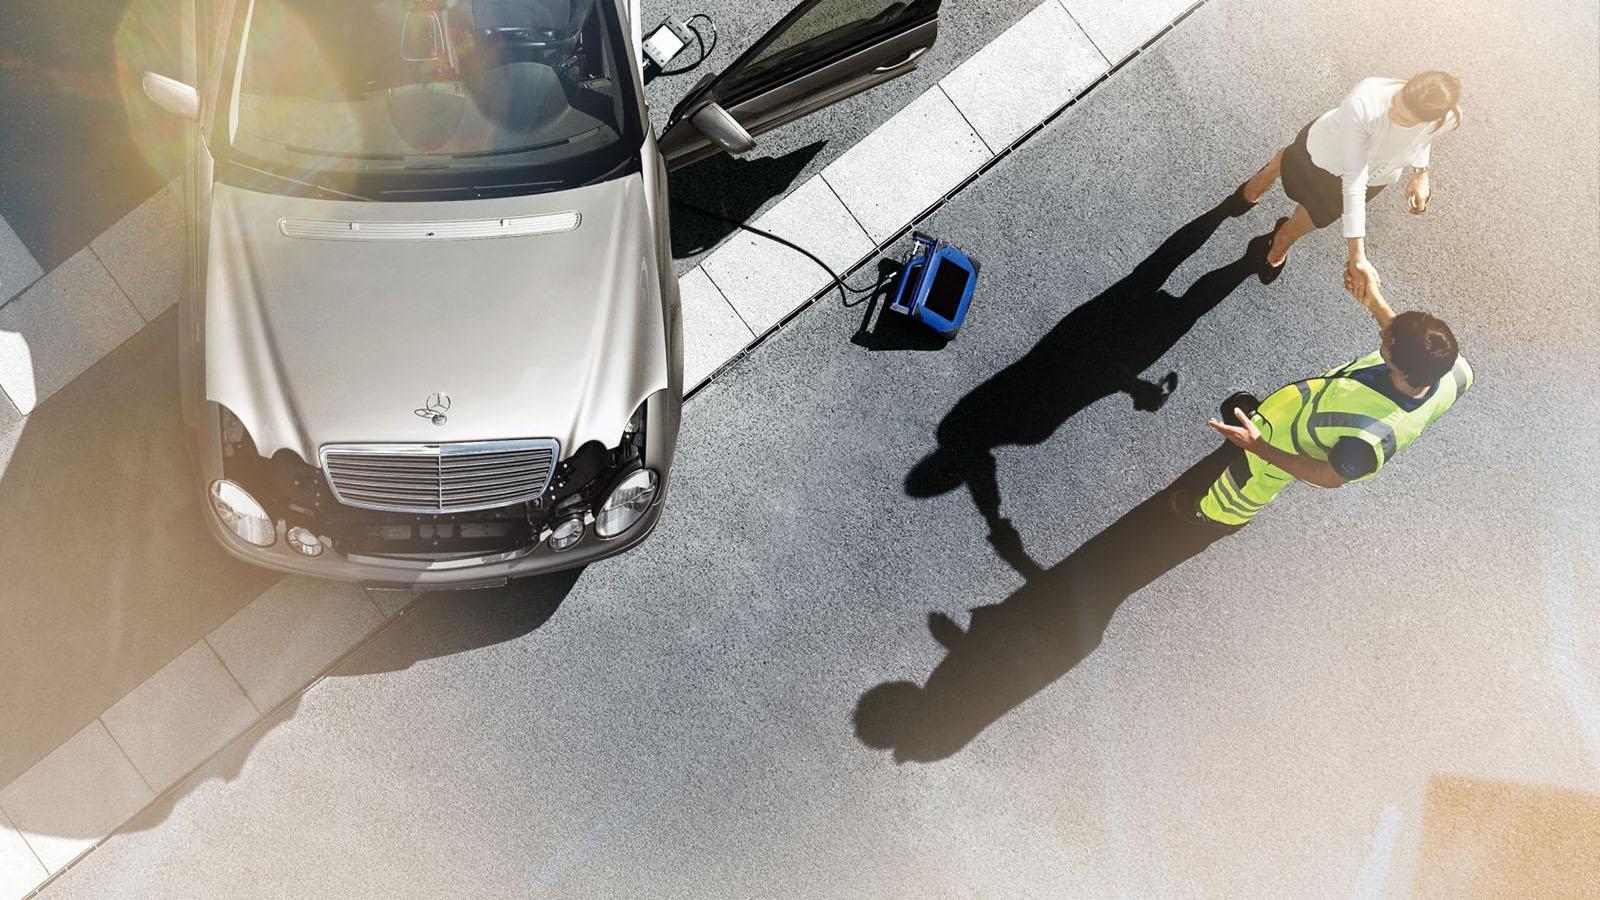 Dịch vụ 24h của Mercedes-Benz